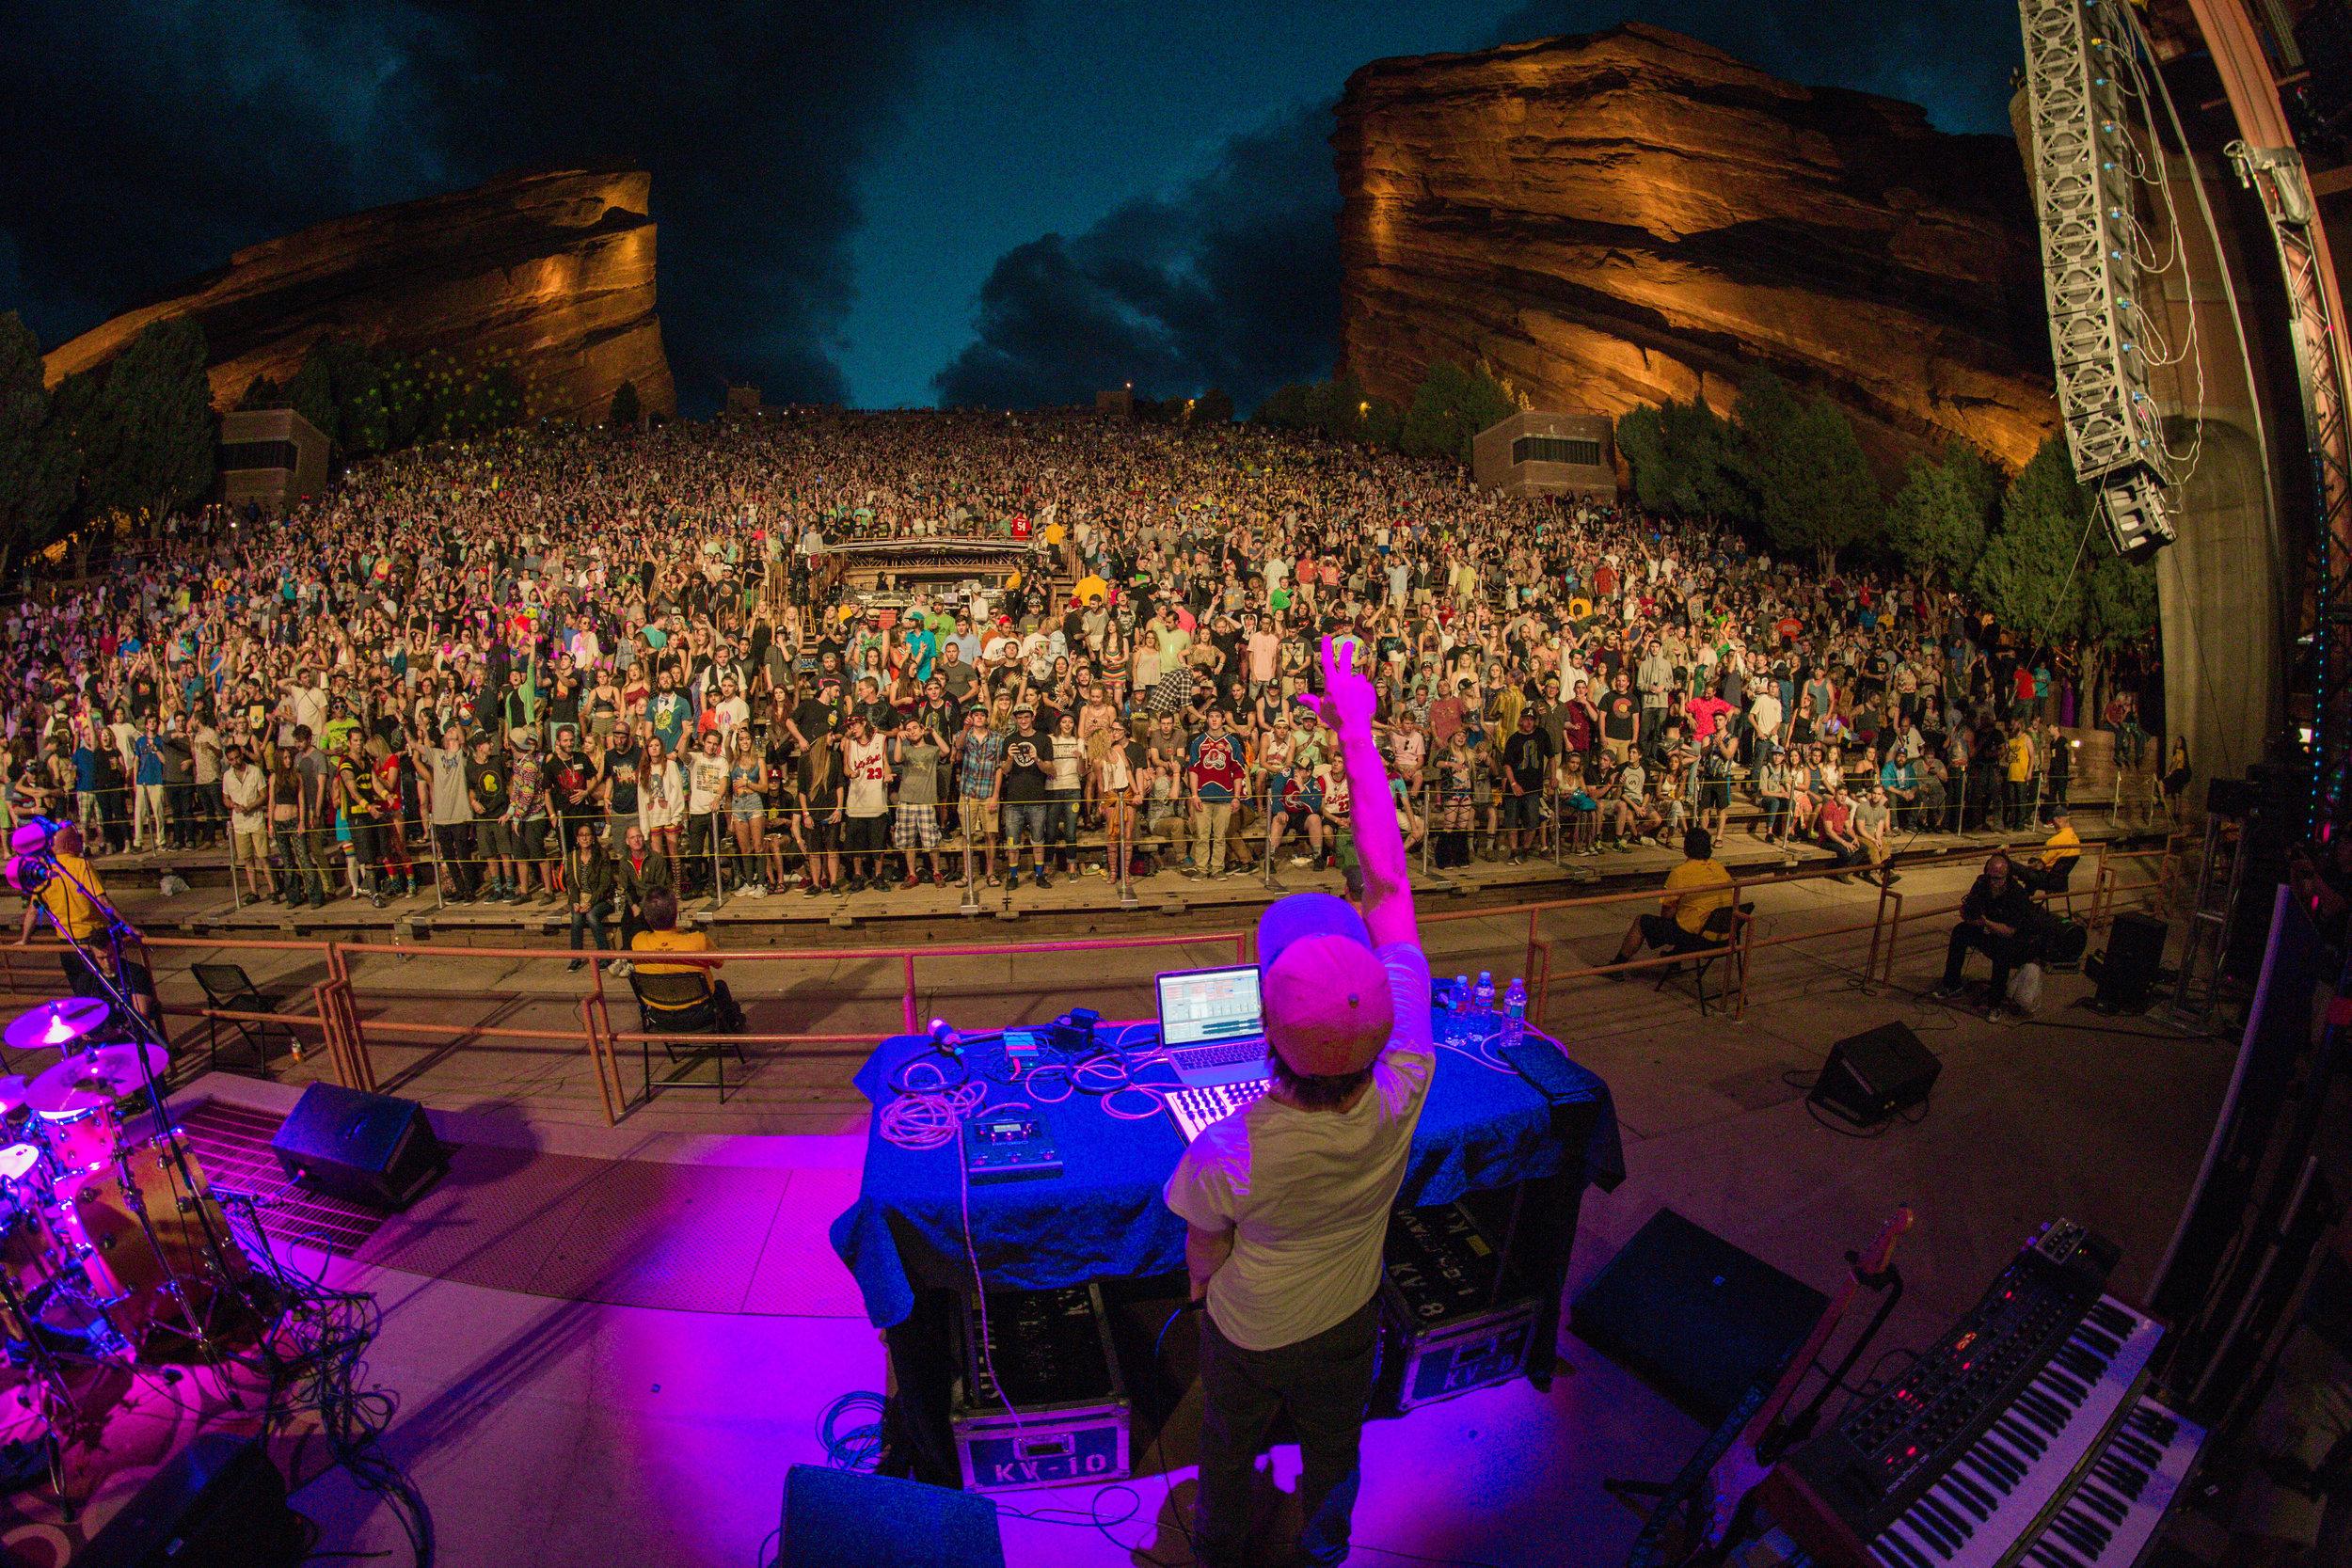 Marvel Years -  @marvelyears   Red Rocks - 8.12.16  Morrison, Colorado